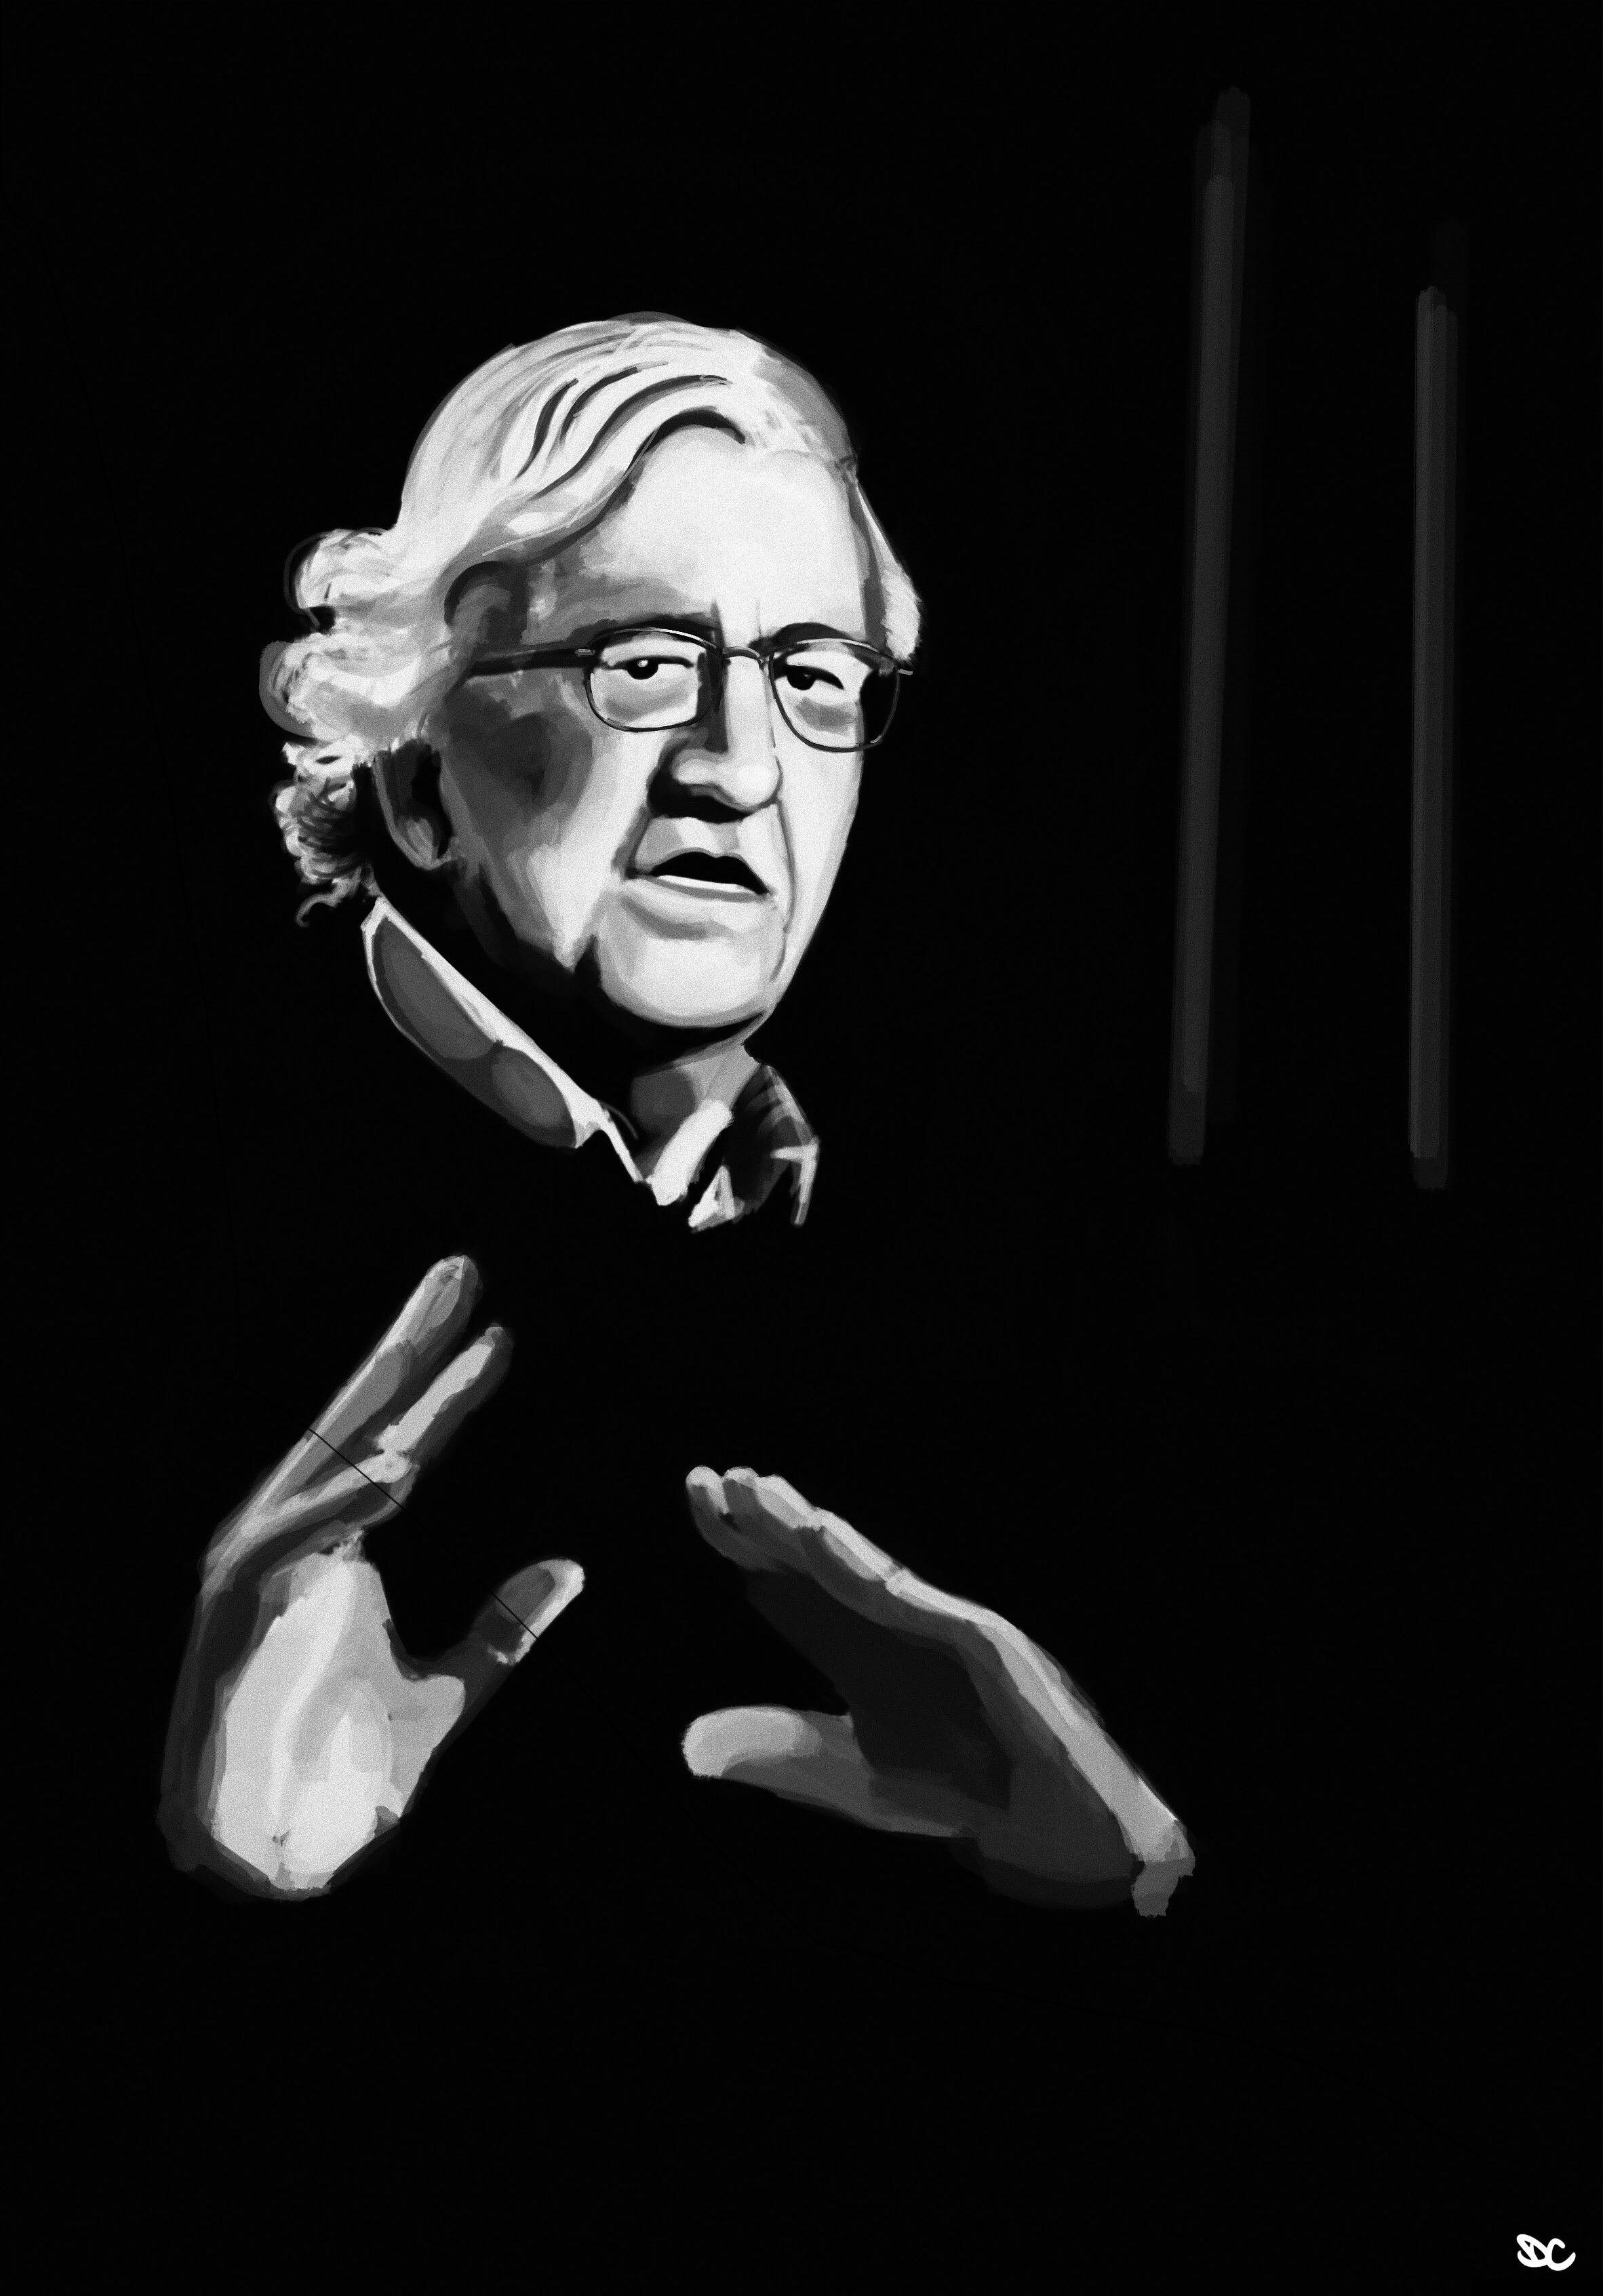 Profiles: Noam Chomsky